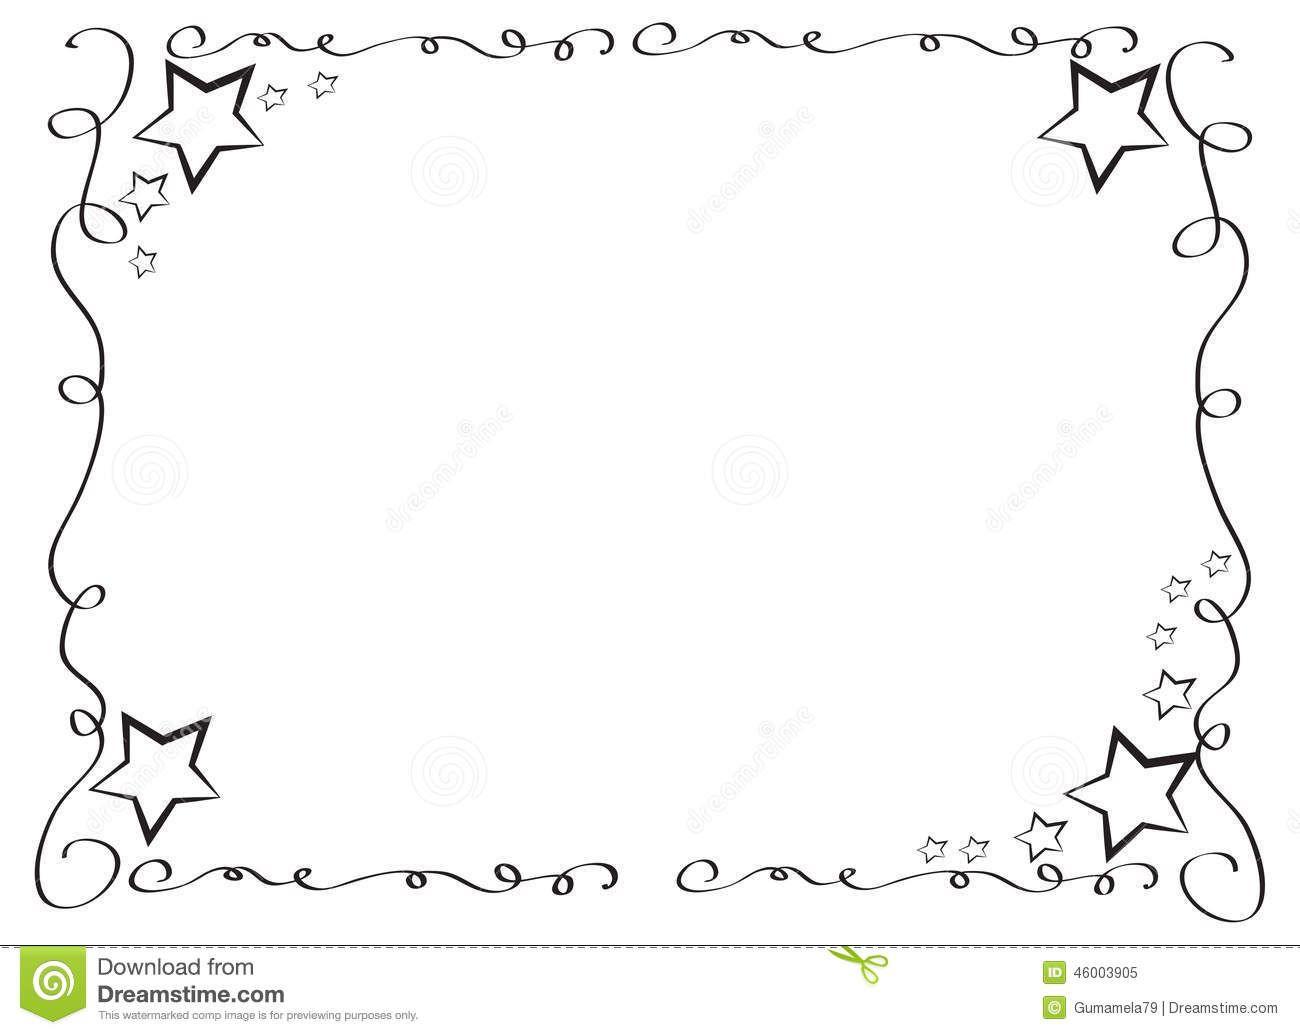 Black And White Star Border Clip Art Decorative Frame Border With